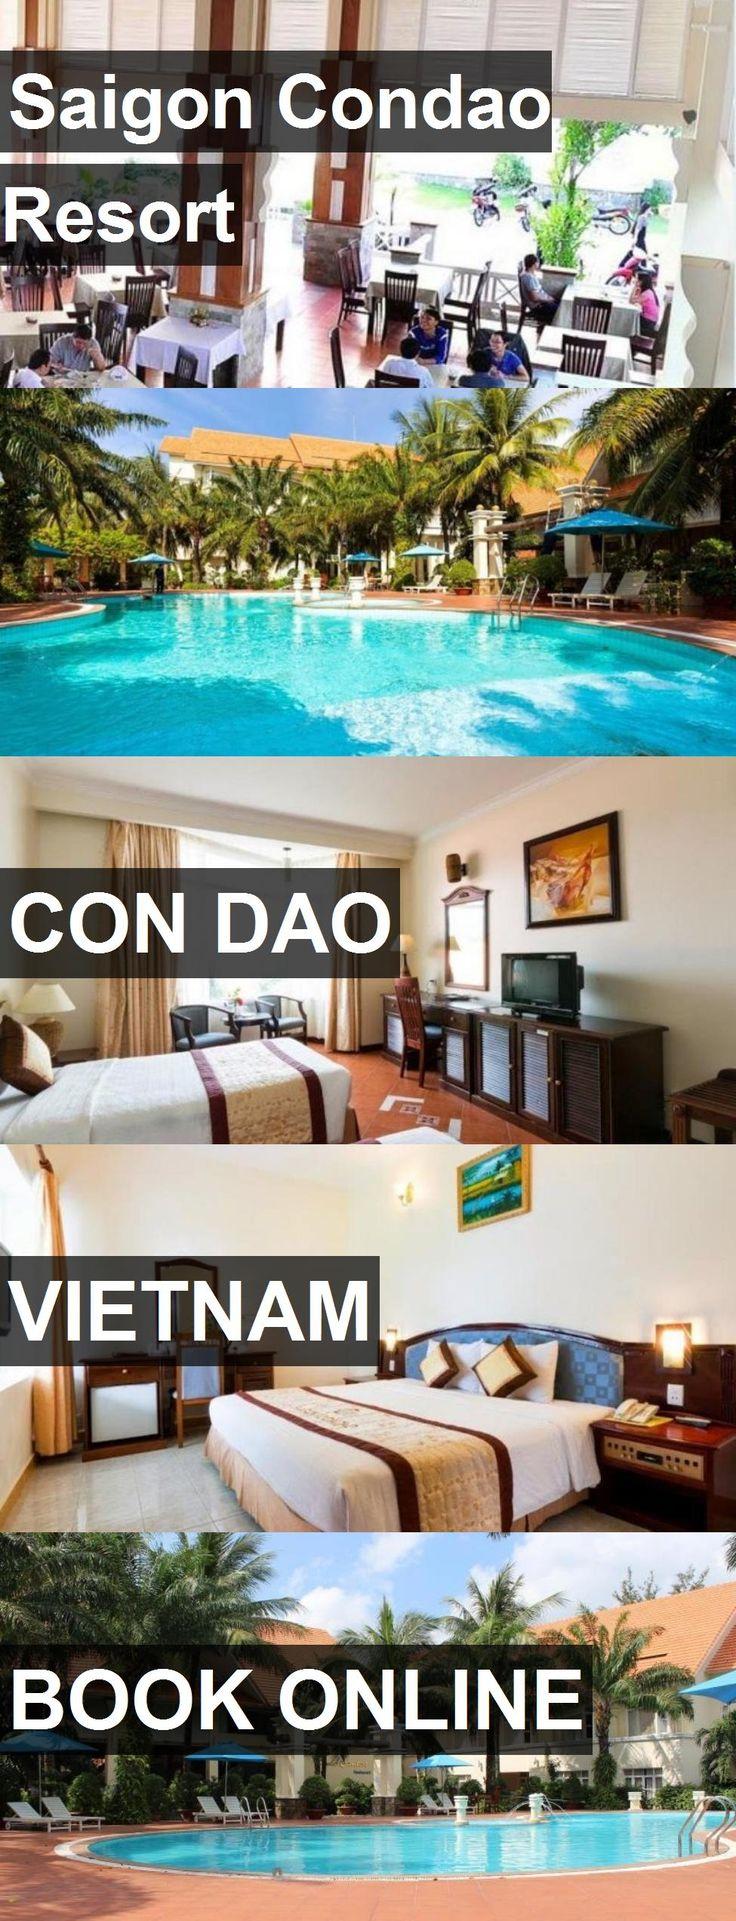 Hotel Saigon Condao Resort in Con Dao, Vietnam. For more information, photos, reviews and best prices please follow the link. #Vietnam #ConDao #SaigonCondaoResort #hotel #travel #vacation